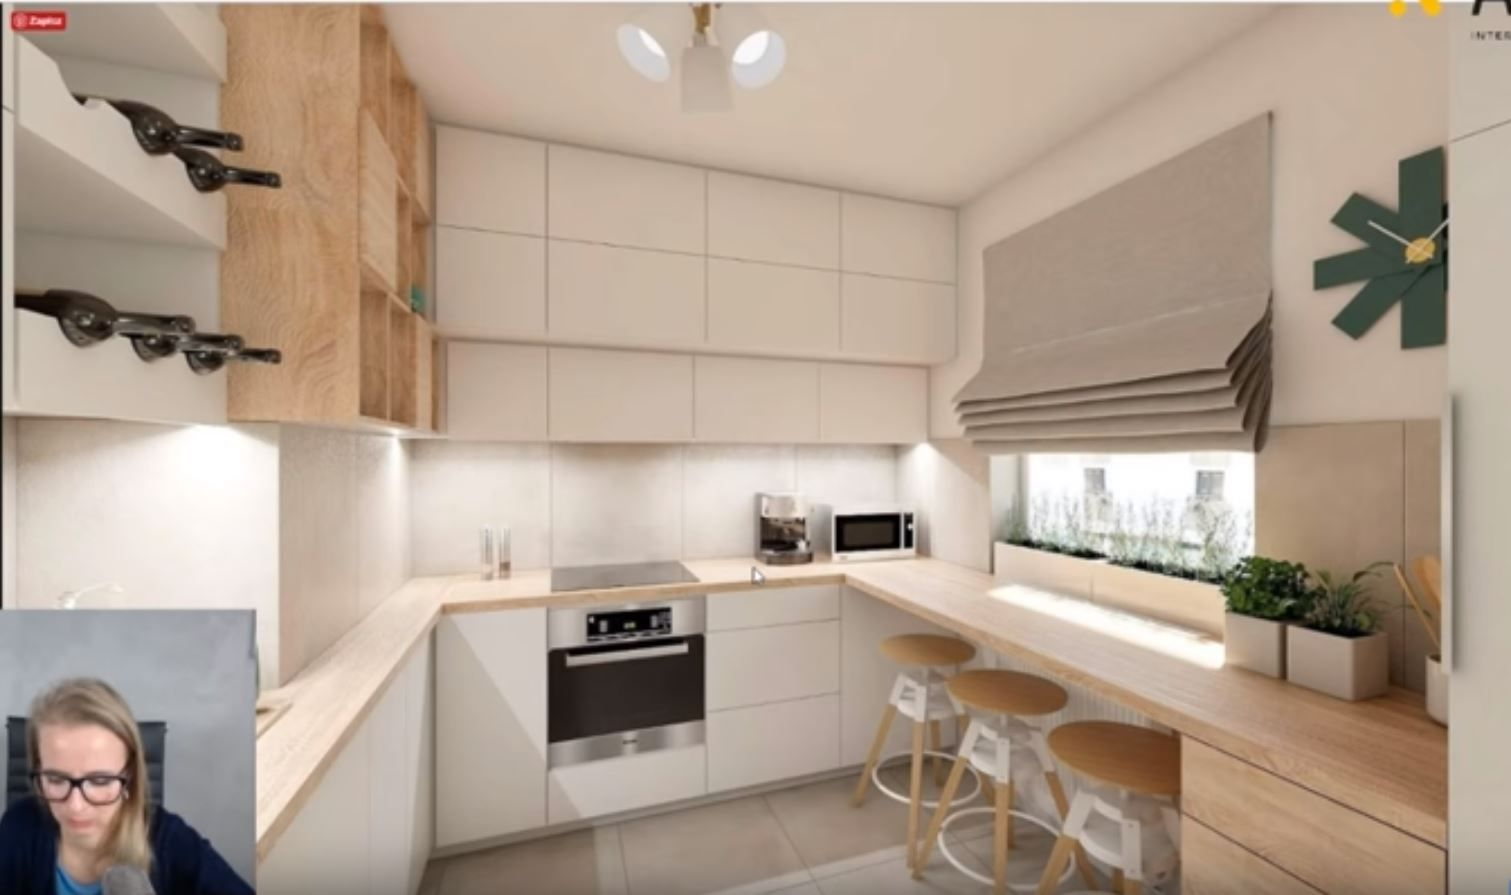 Co Zrobic Jesli Kaloryfer Jest Pod Oknem W Kuchni Kitchen Cabinets Kitchen Home